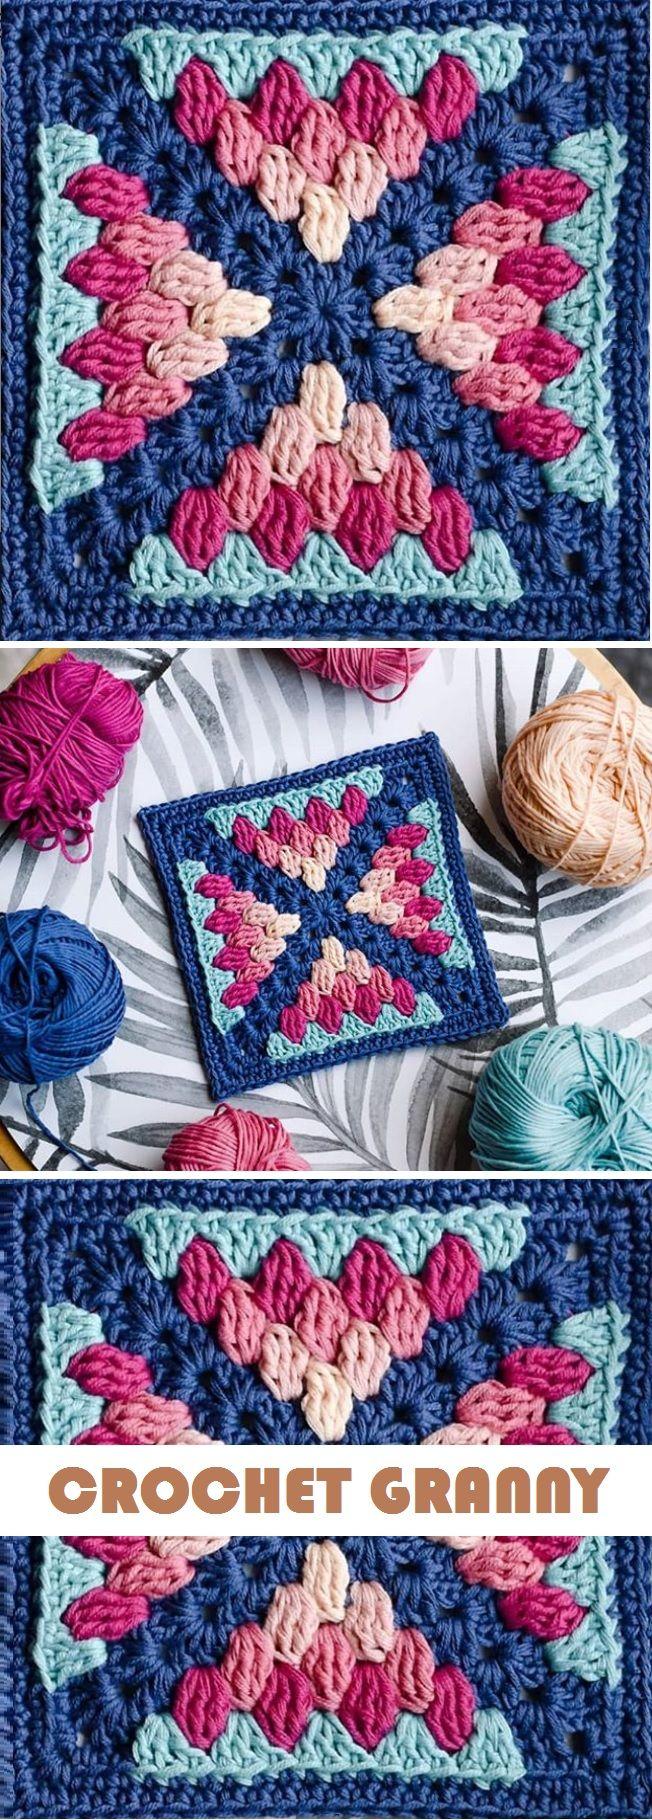 Crochet: Farmhouse Granny Blanket – Handmade paris